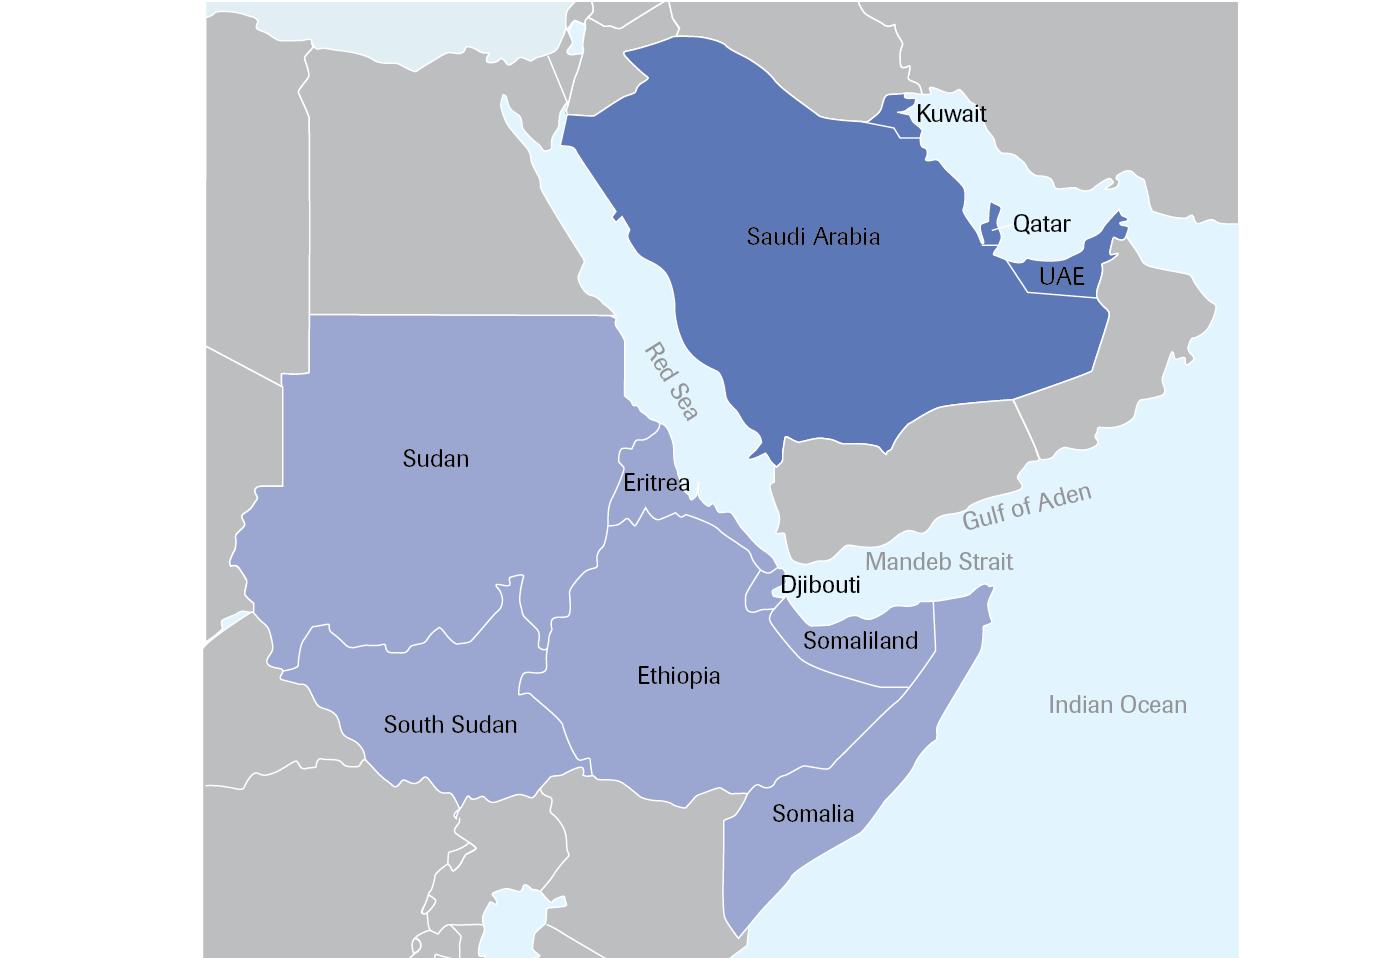 Riyal Politik on map of the gambia, map of malaysia, map of norway, map of angola, map of africa, map of swaziland, map of tunisia, map of middle east, map of bahamas, map of ethiopia, map of morocco, map of somaliland, map of afghanistan, map of sudan, map of nepal, map of niger, map of yemen, map of kenya, map of burundi, map of tanzania,